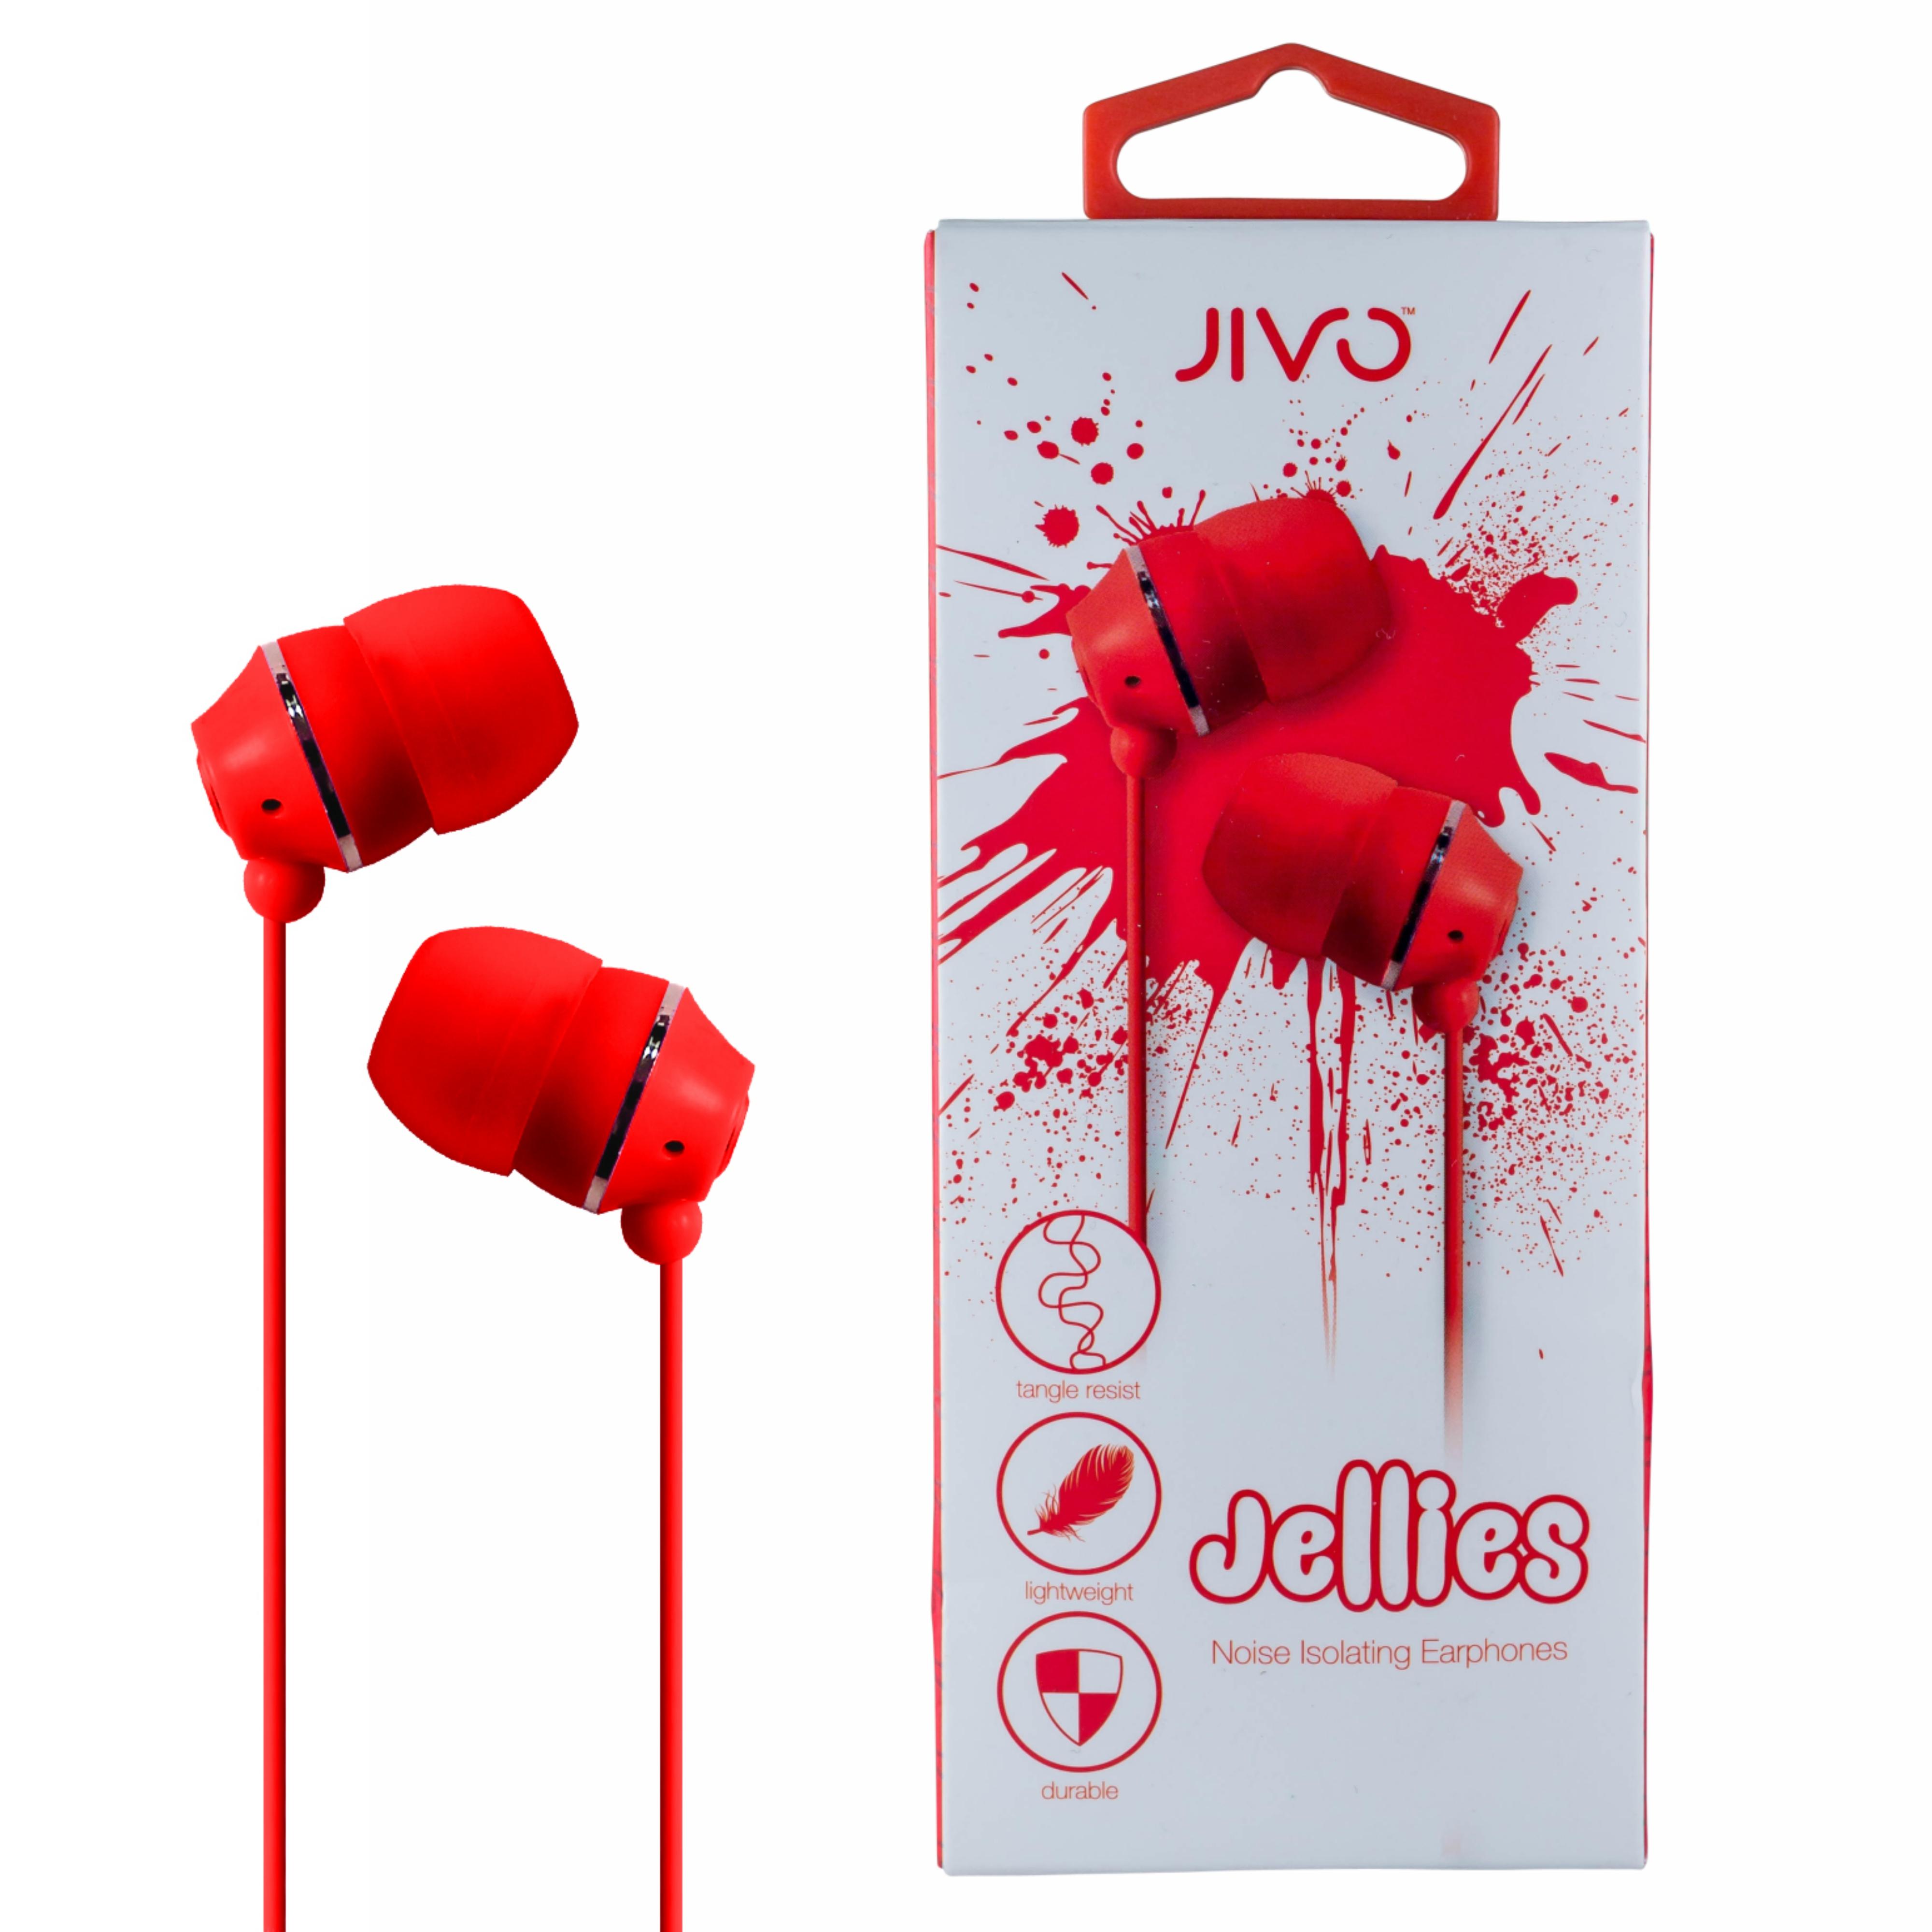 Jivo JI-1060R Jellies In-Ear Noise Isolating Earphone|Soft & Comfy|Strawberry|New